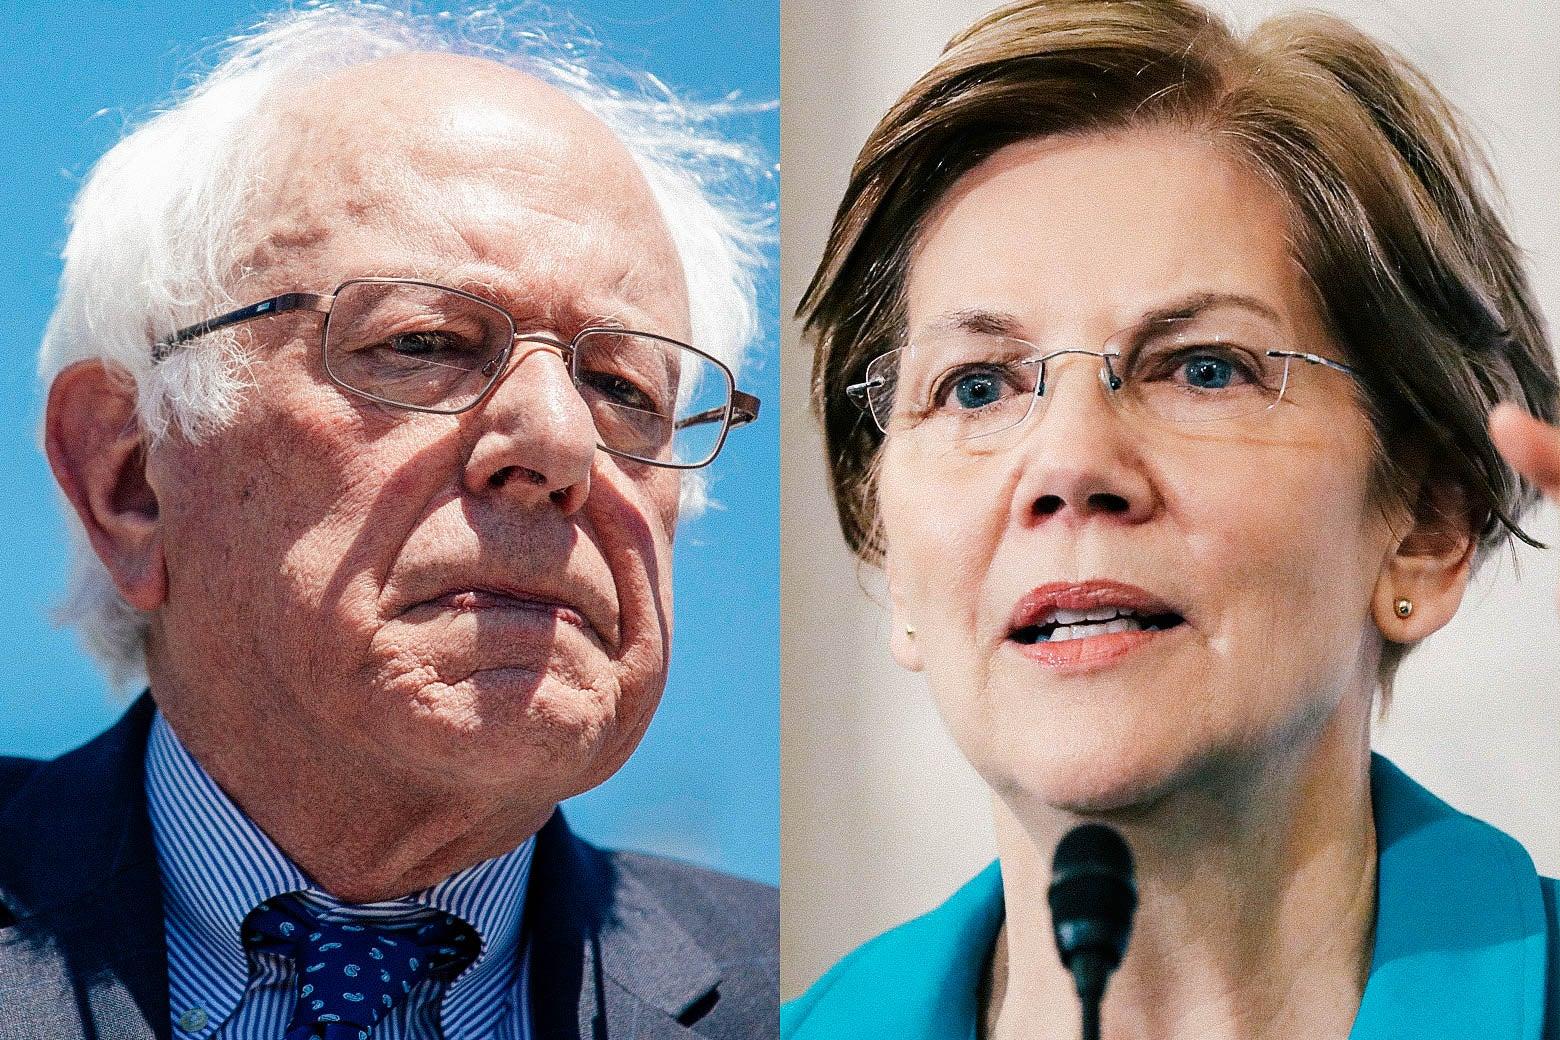 Sens. Bernie Sanders and Elizabeth Warren